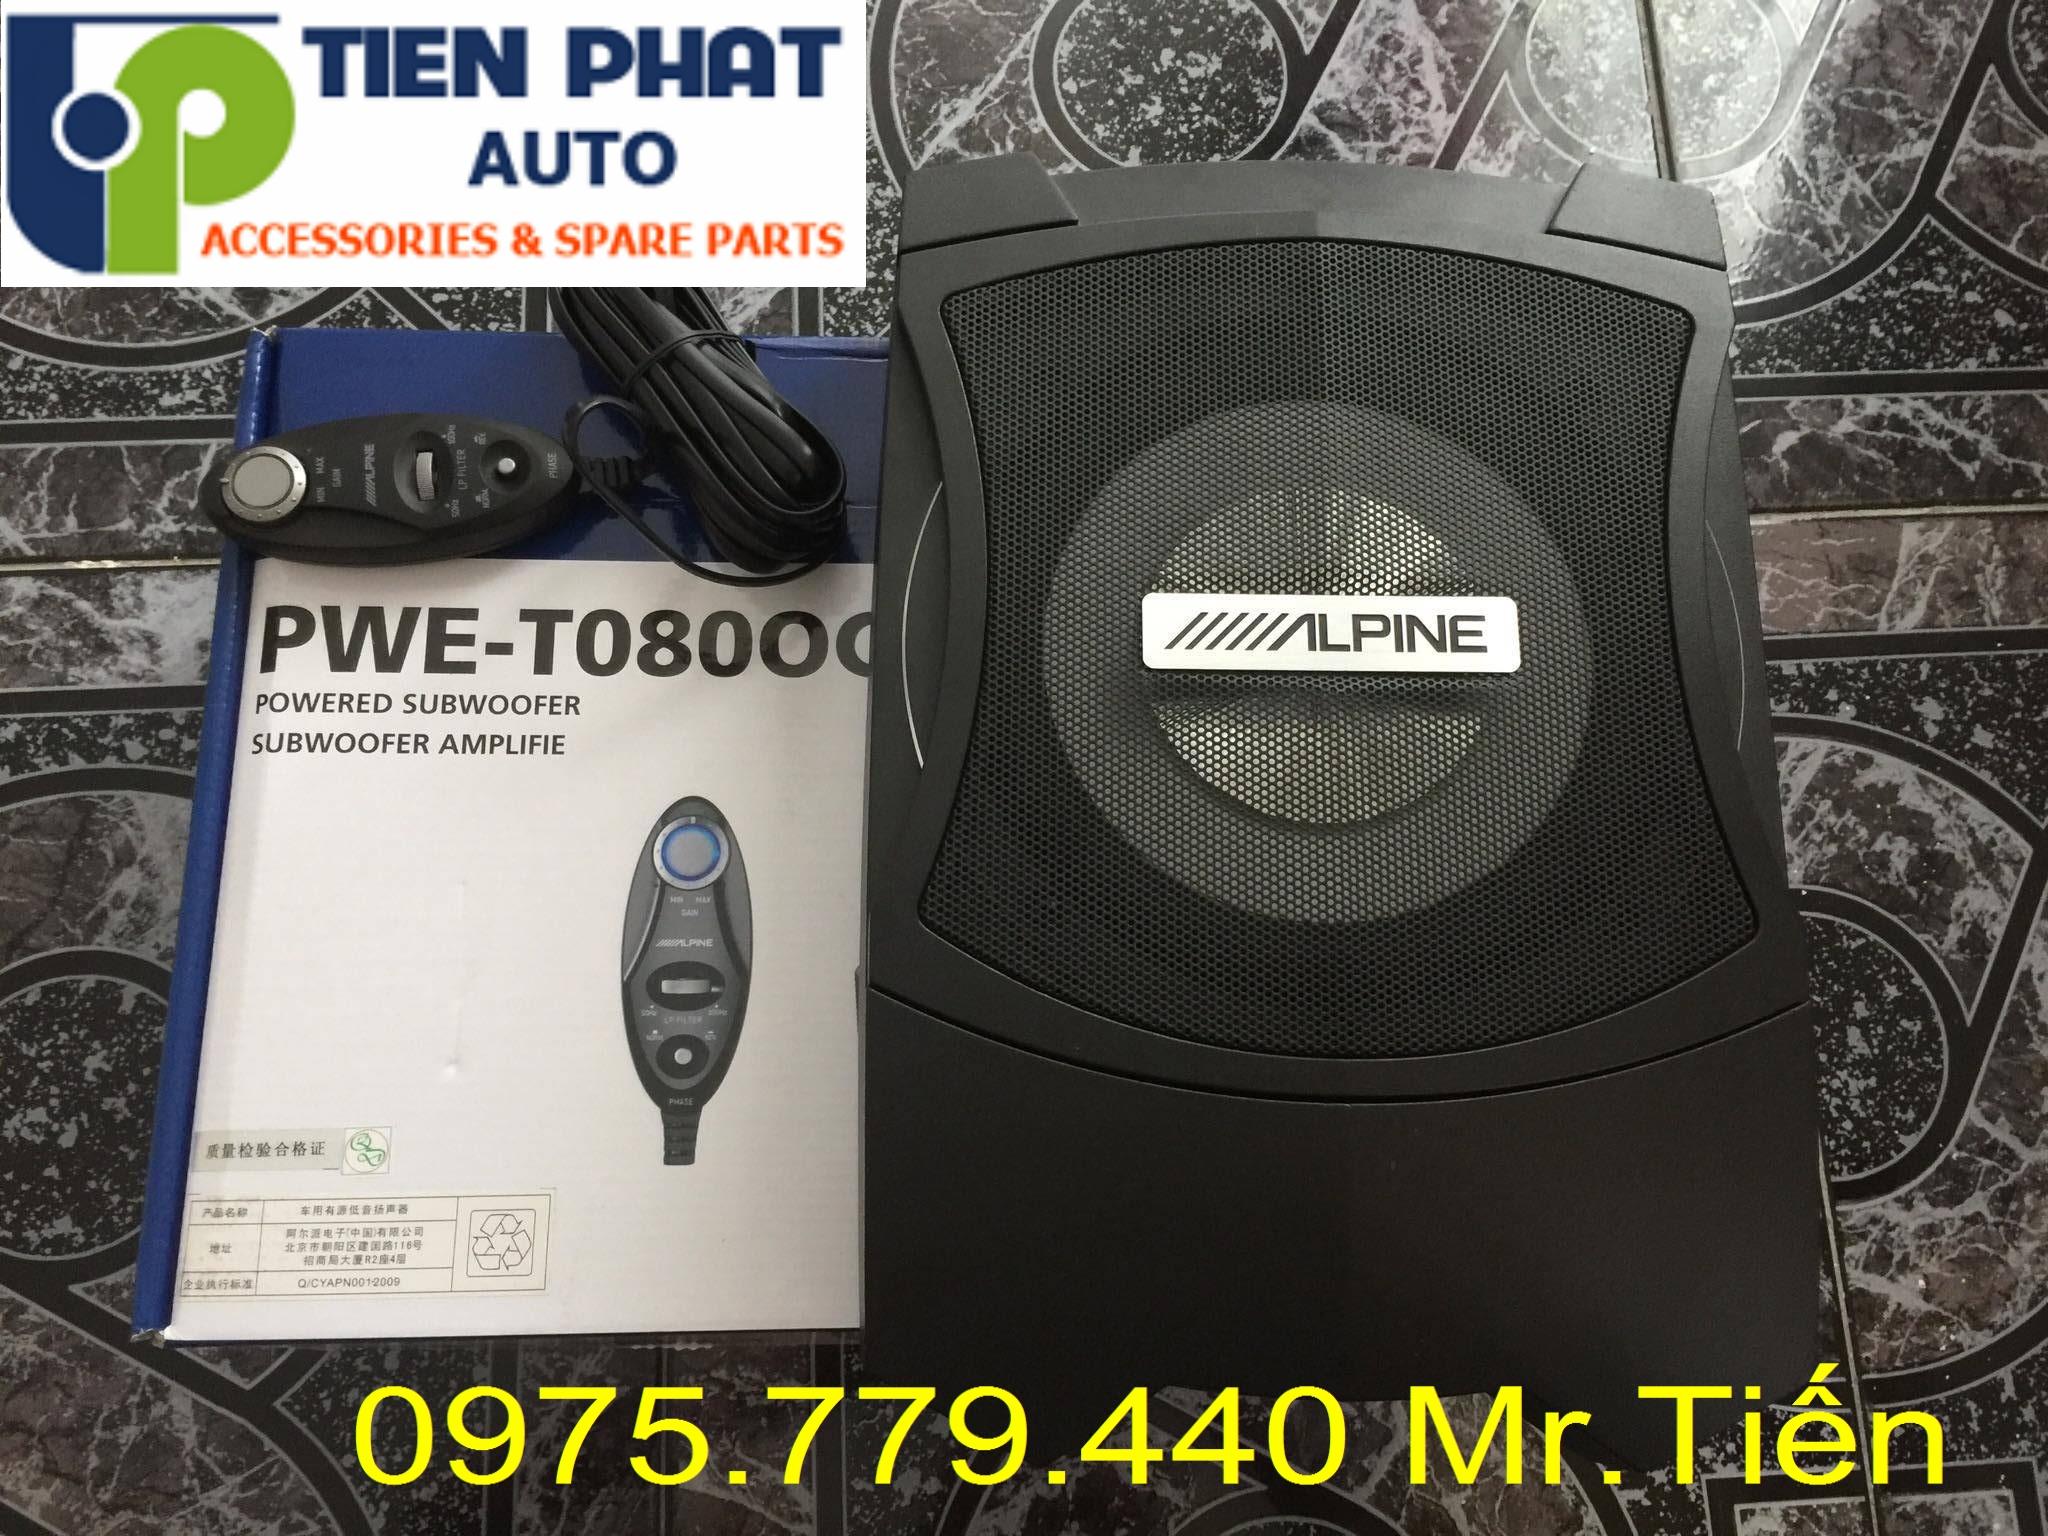 Lắp Loa sub Alpine PWE-T0800C cho Ford Fiesta Lắp Đặt Tận Nơi